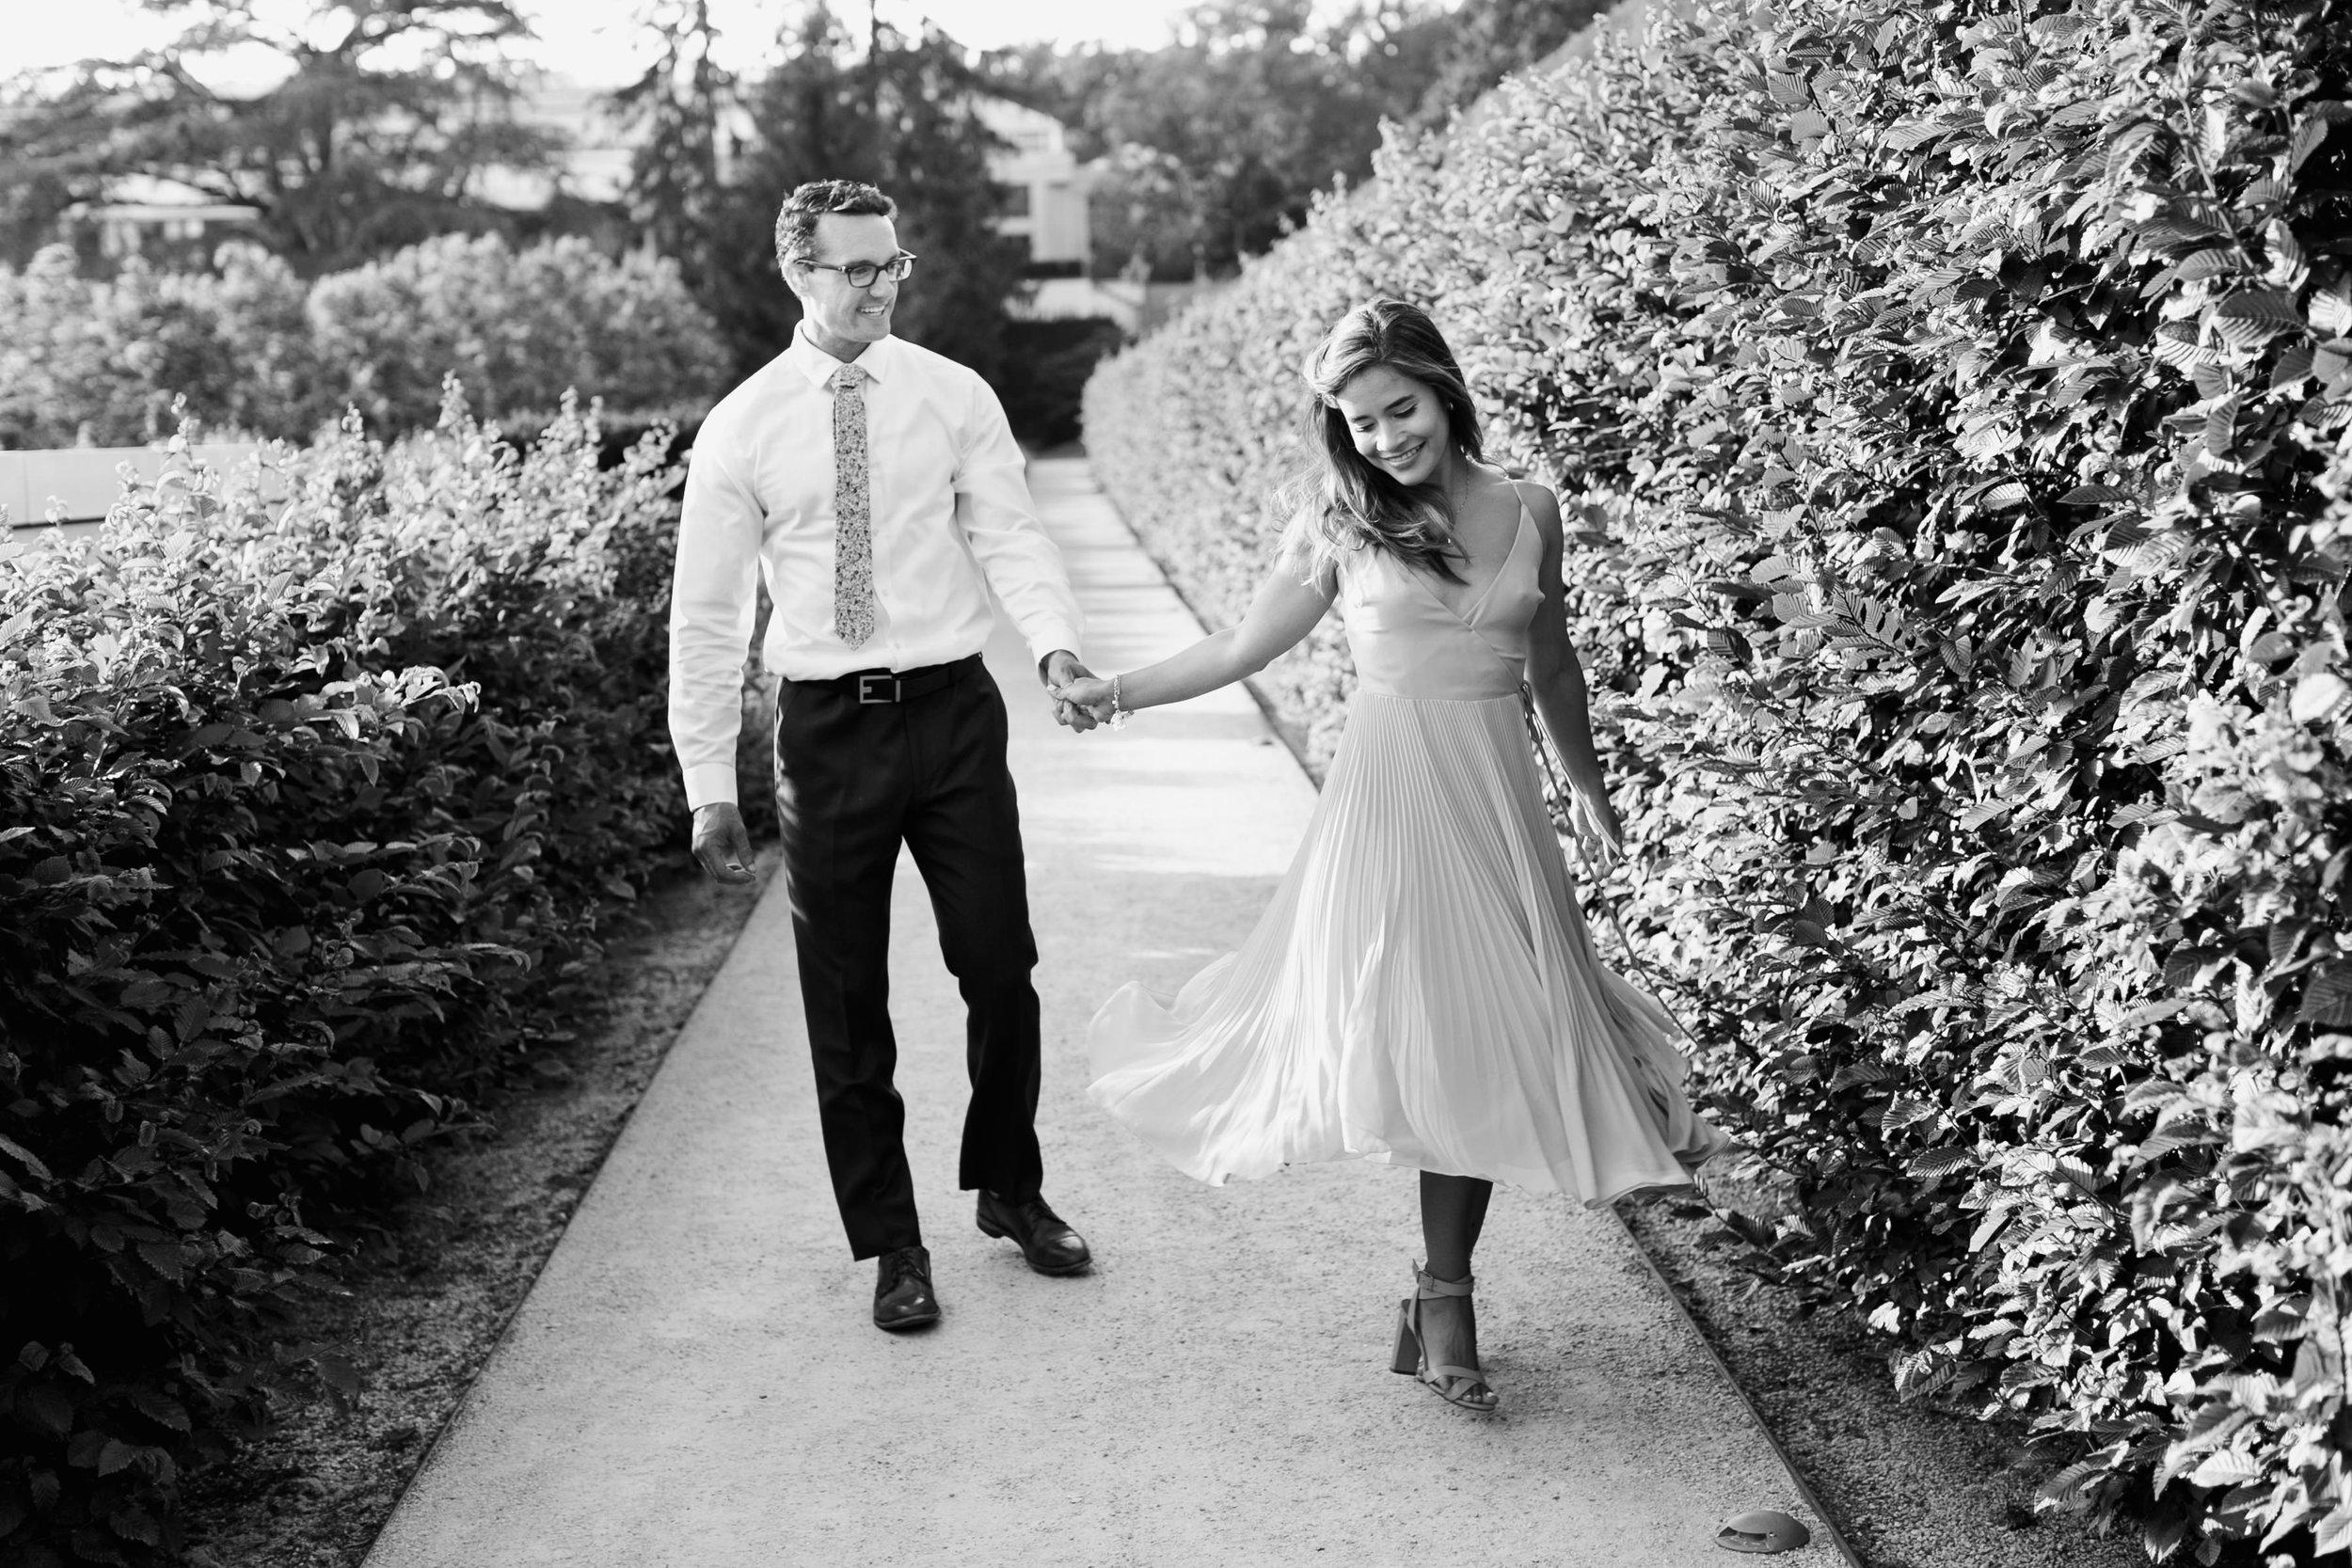 photography-natural-candid-engaged-proposal-philadelphia-wedding-longwood gardends-nature-flowers-modern-lifestyle-03.JPG